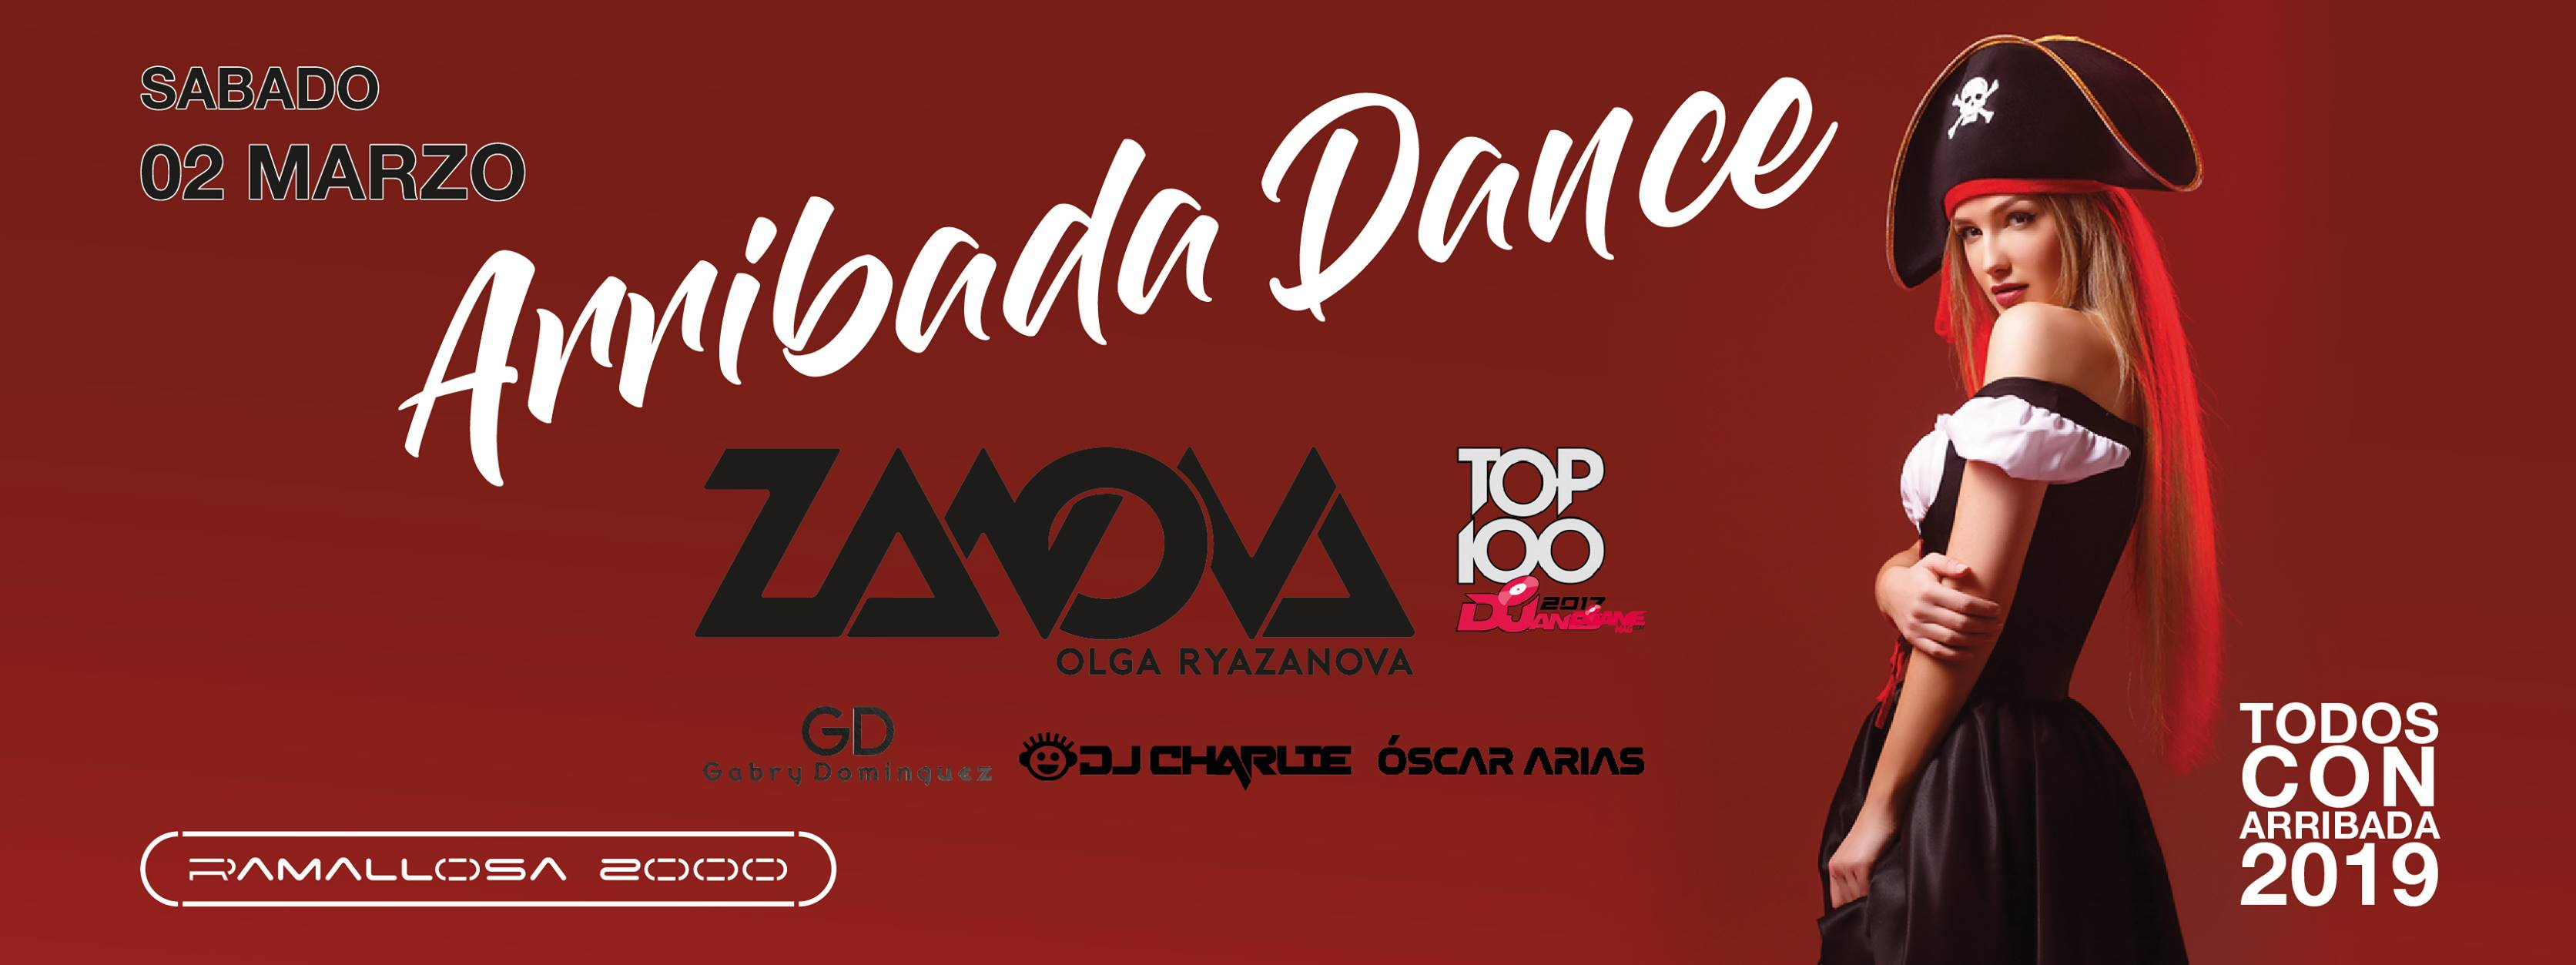 02-03-2019 Ramallosa 2000 arribada dance